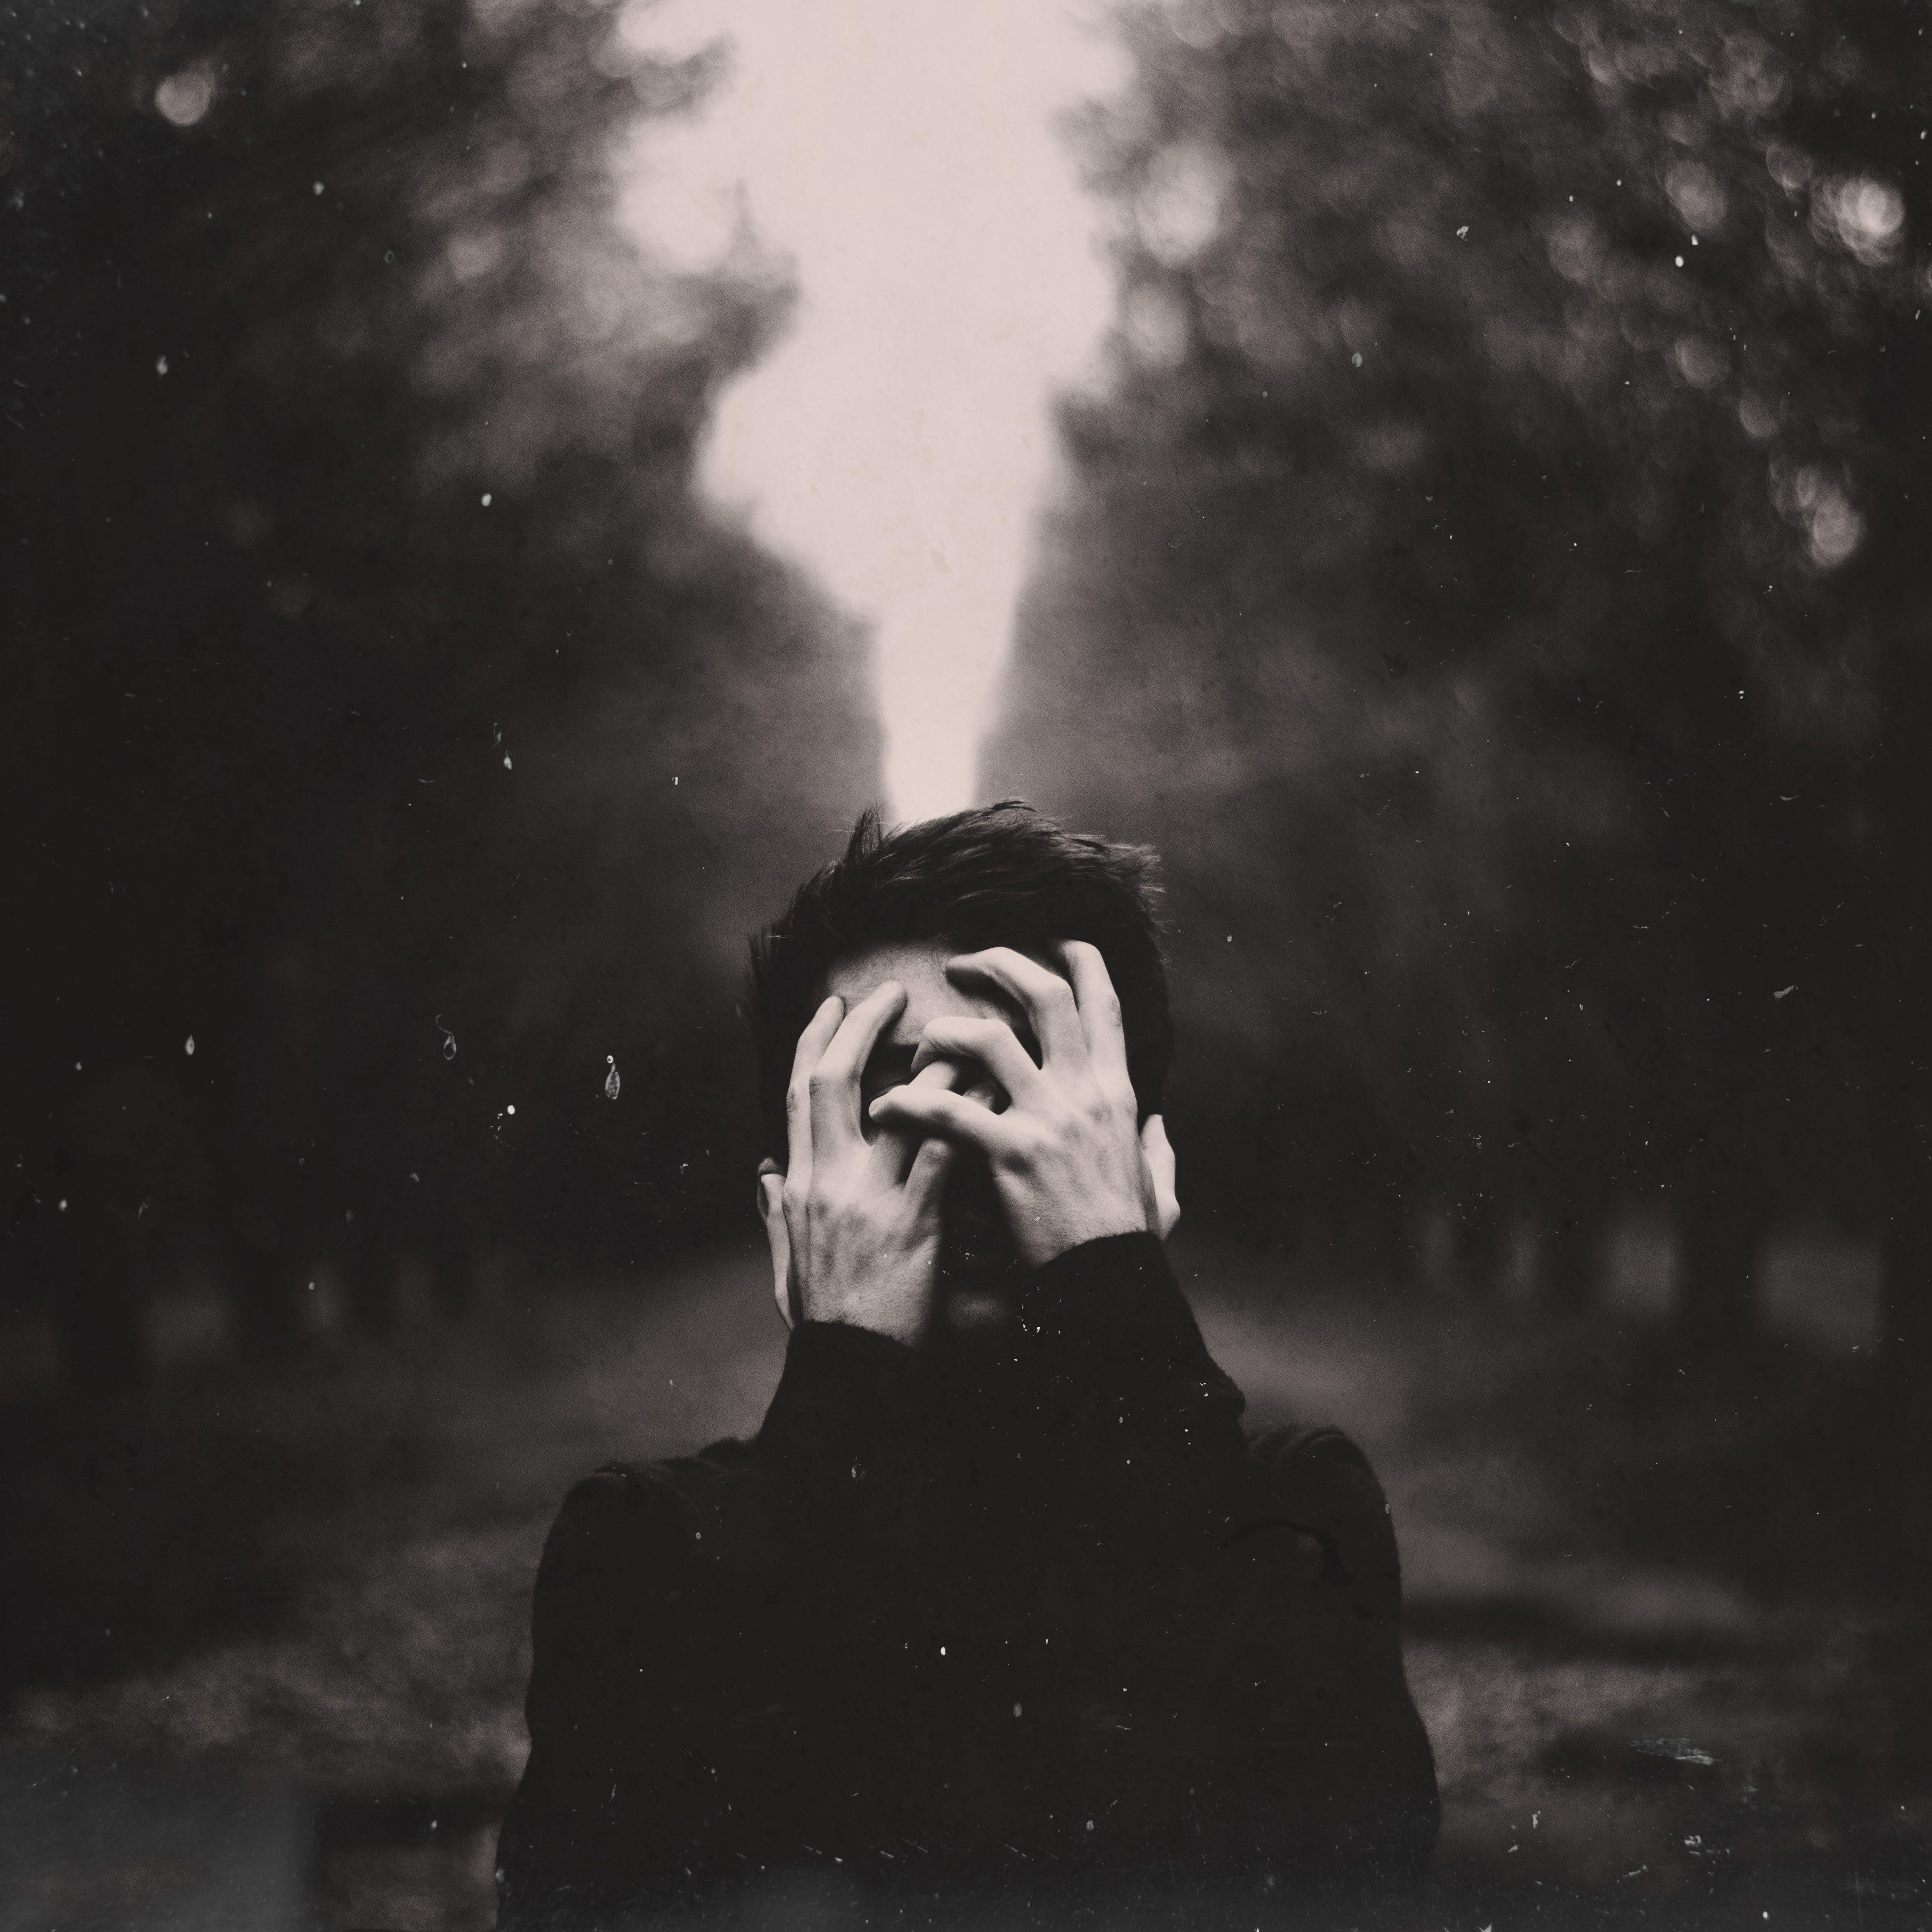 Conceptual black and white portrait by bradley branson conceptual